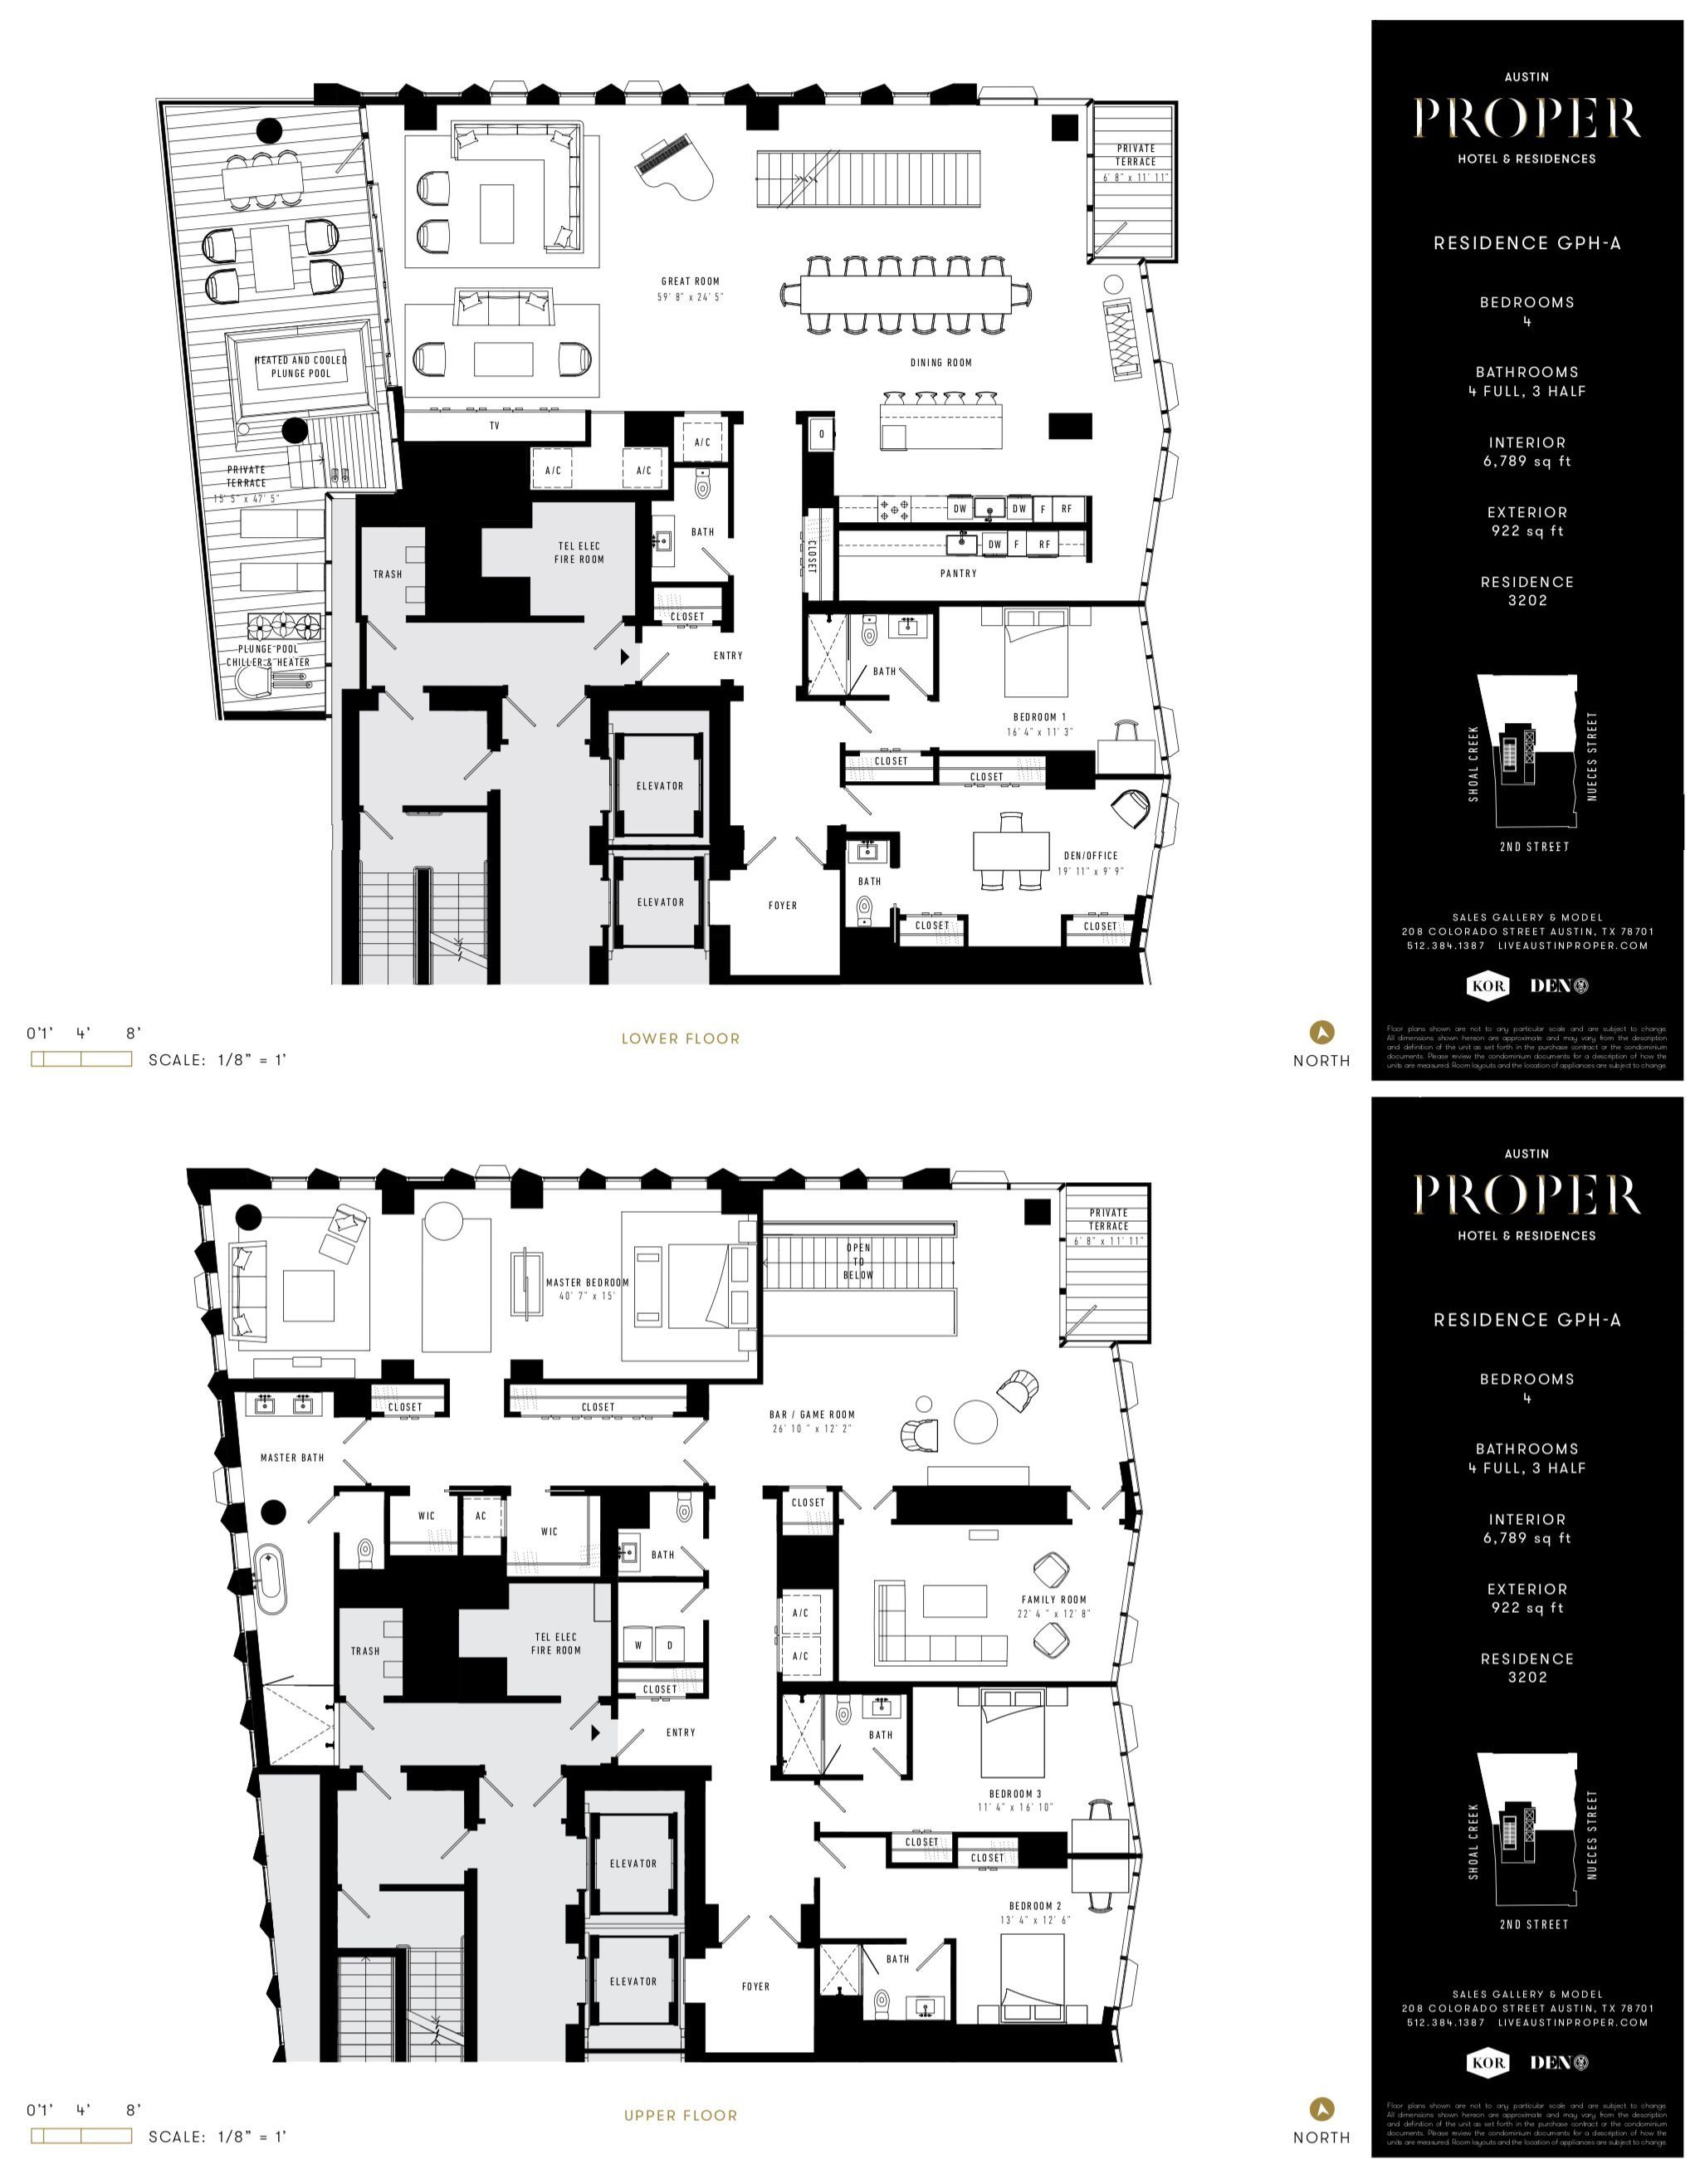 Austin Proper Hotel Residences Gph A Condo Floor Plans Floor Plans Apartment Floor Plans